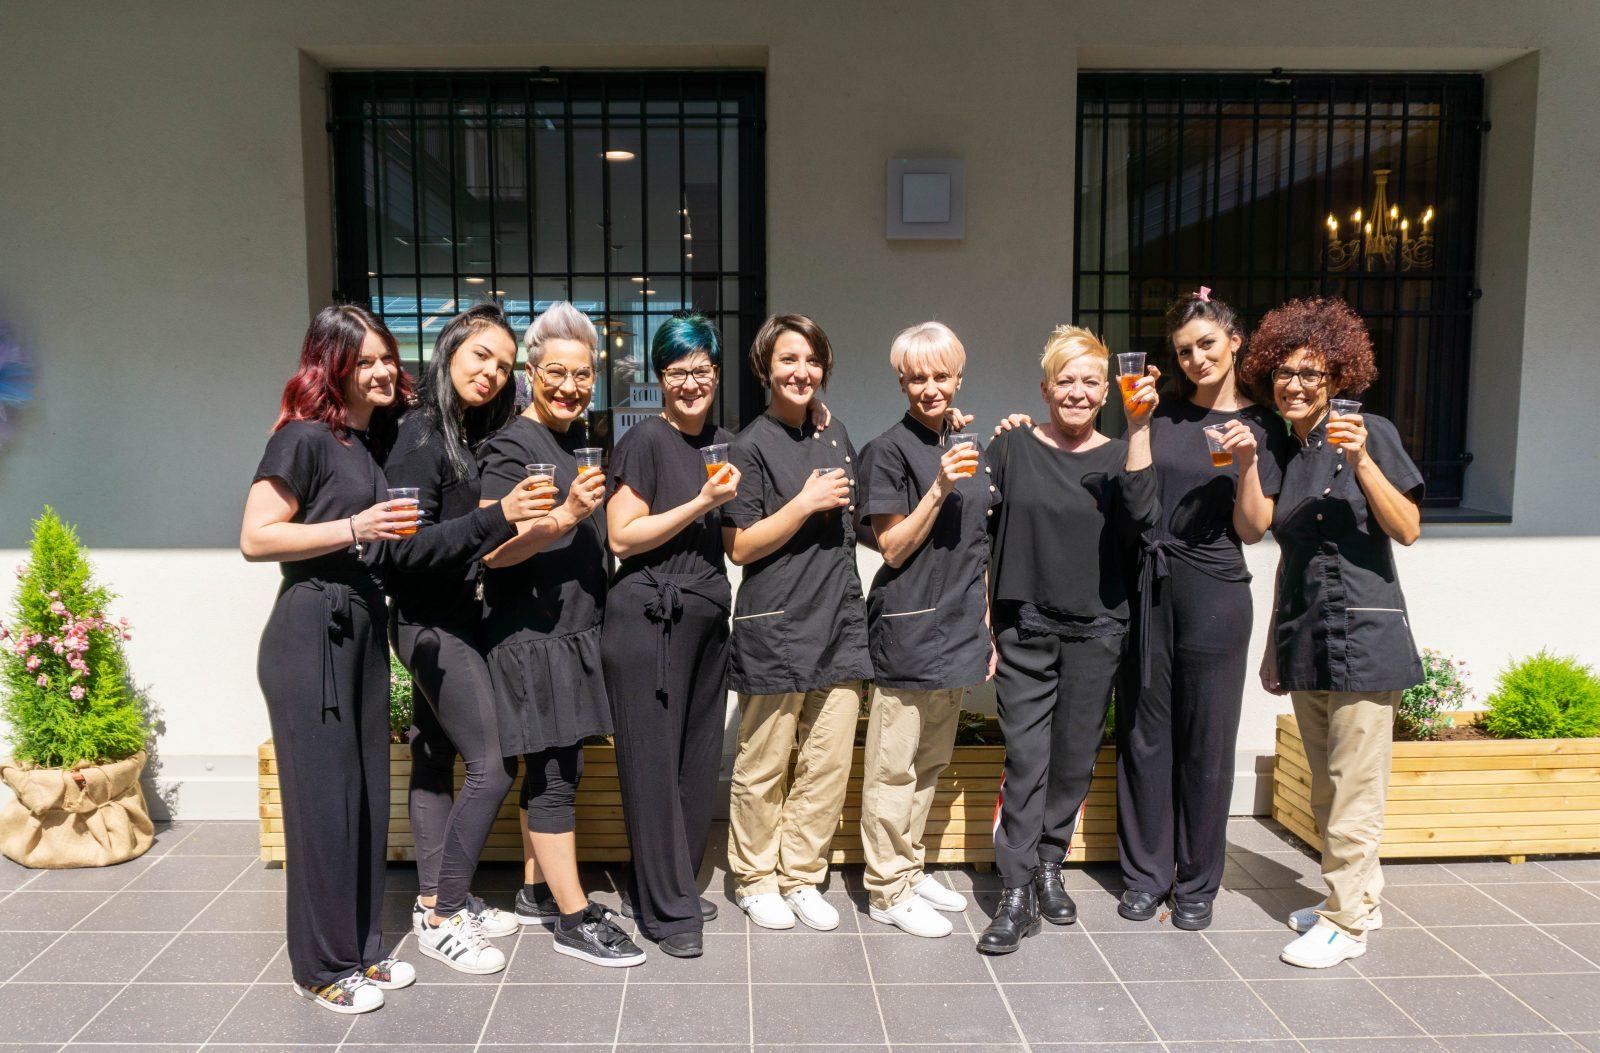 lideale hair salon, vicenza italy